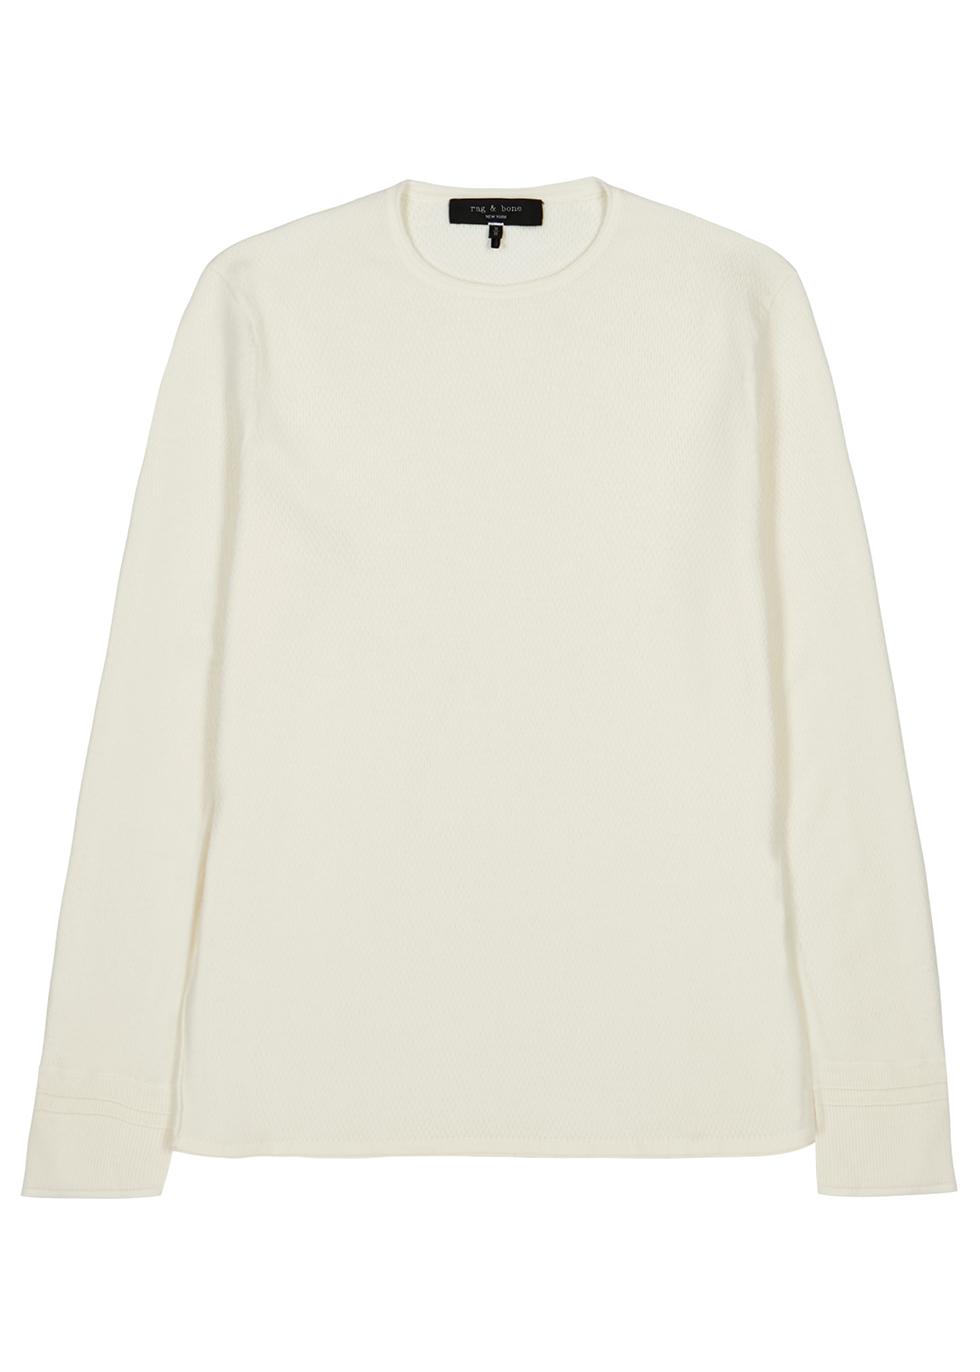 Ivory fine-knit jumper